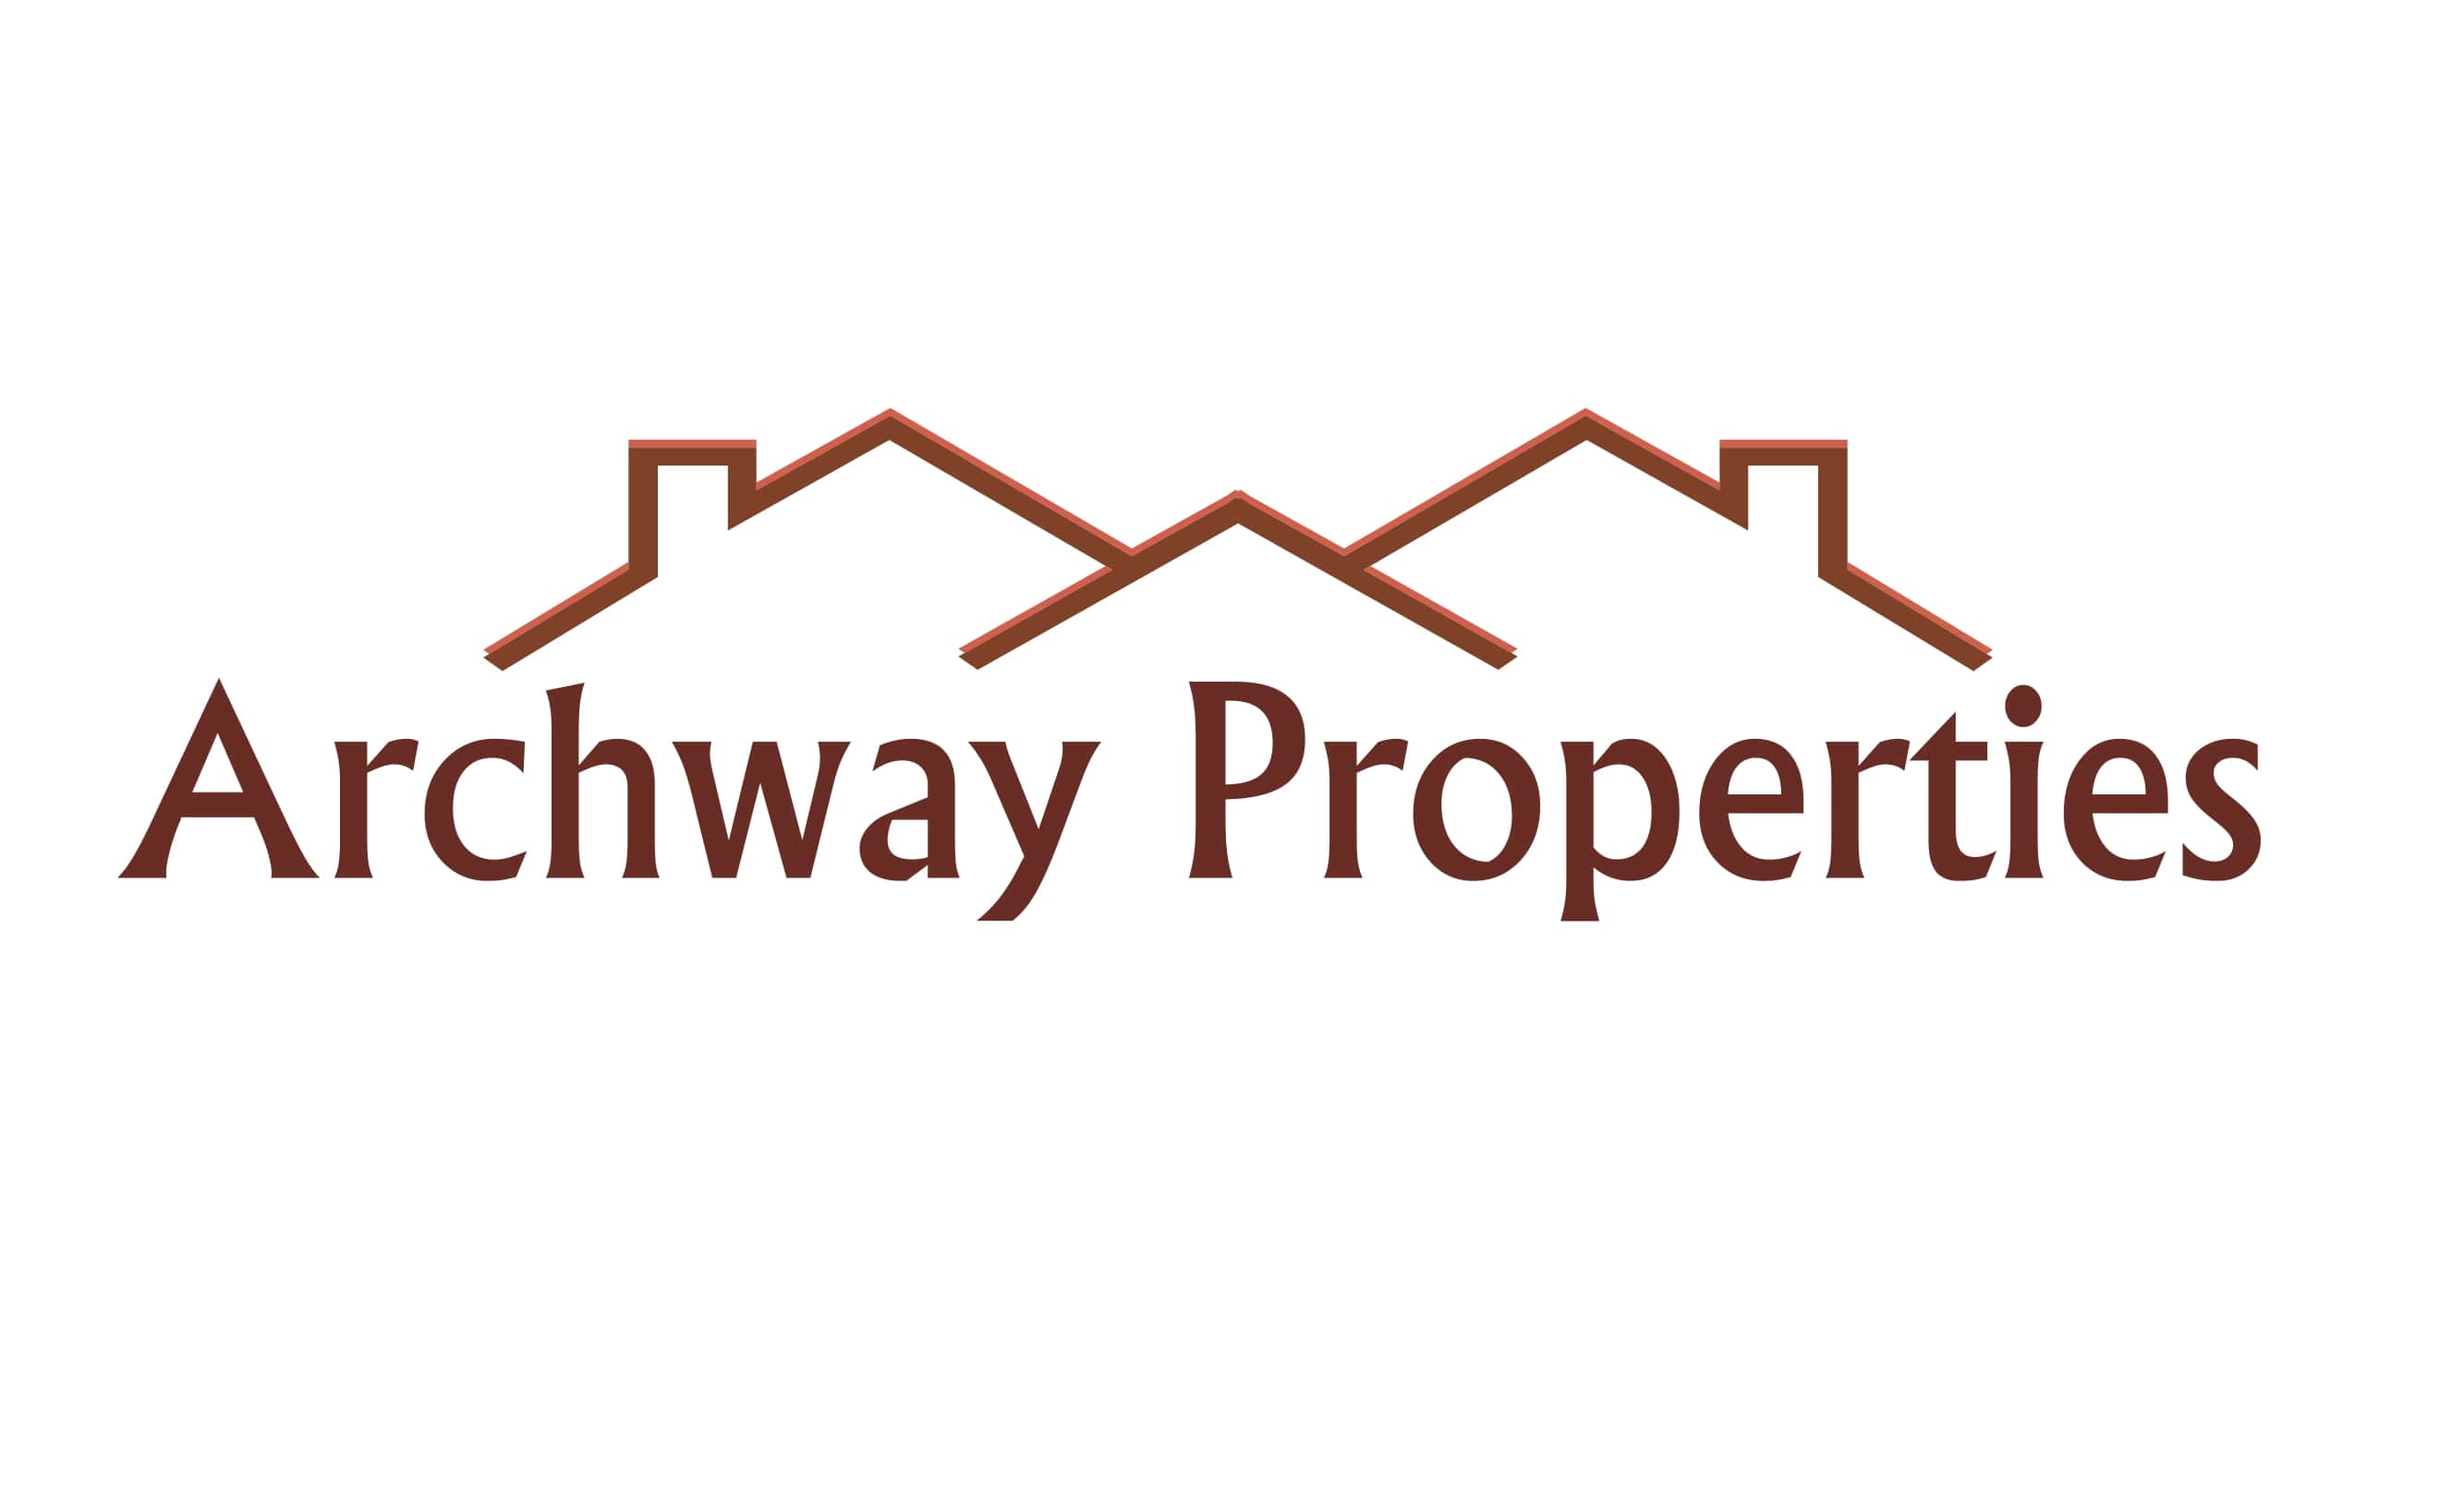 Archway Properties